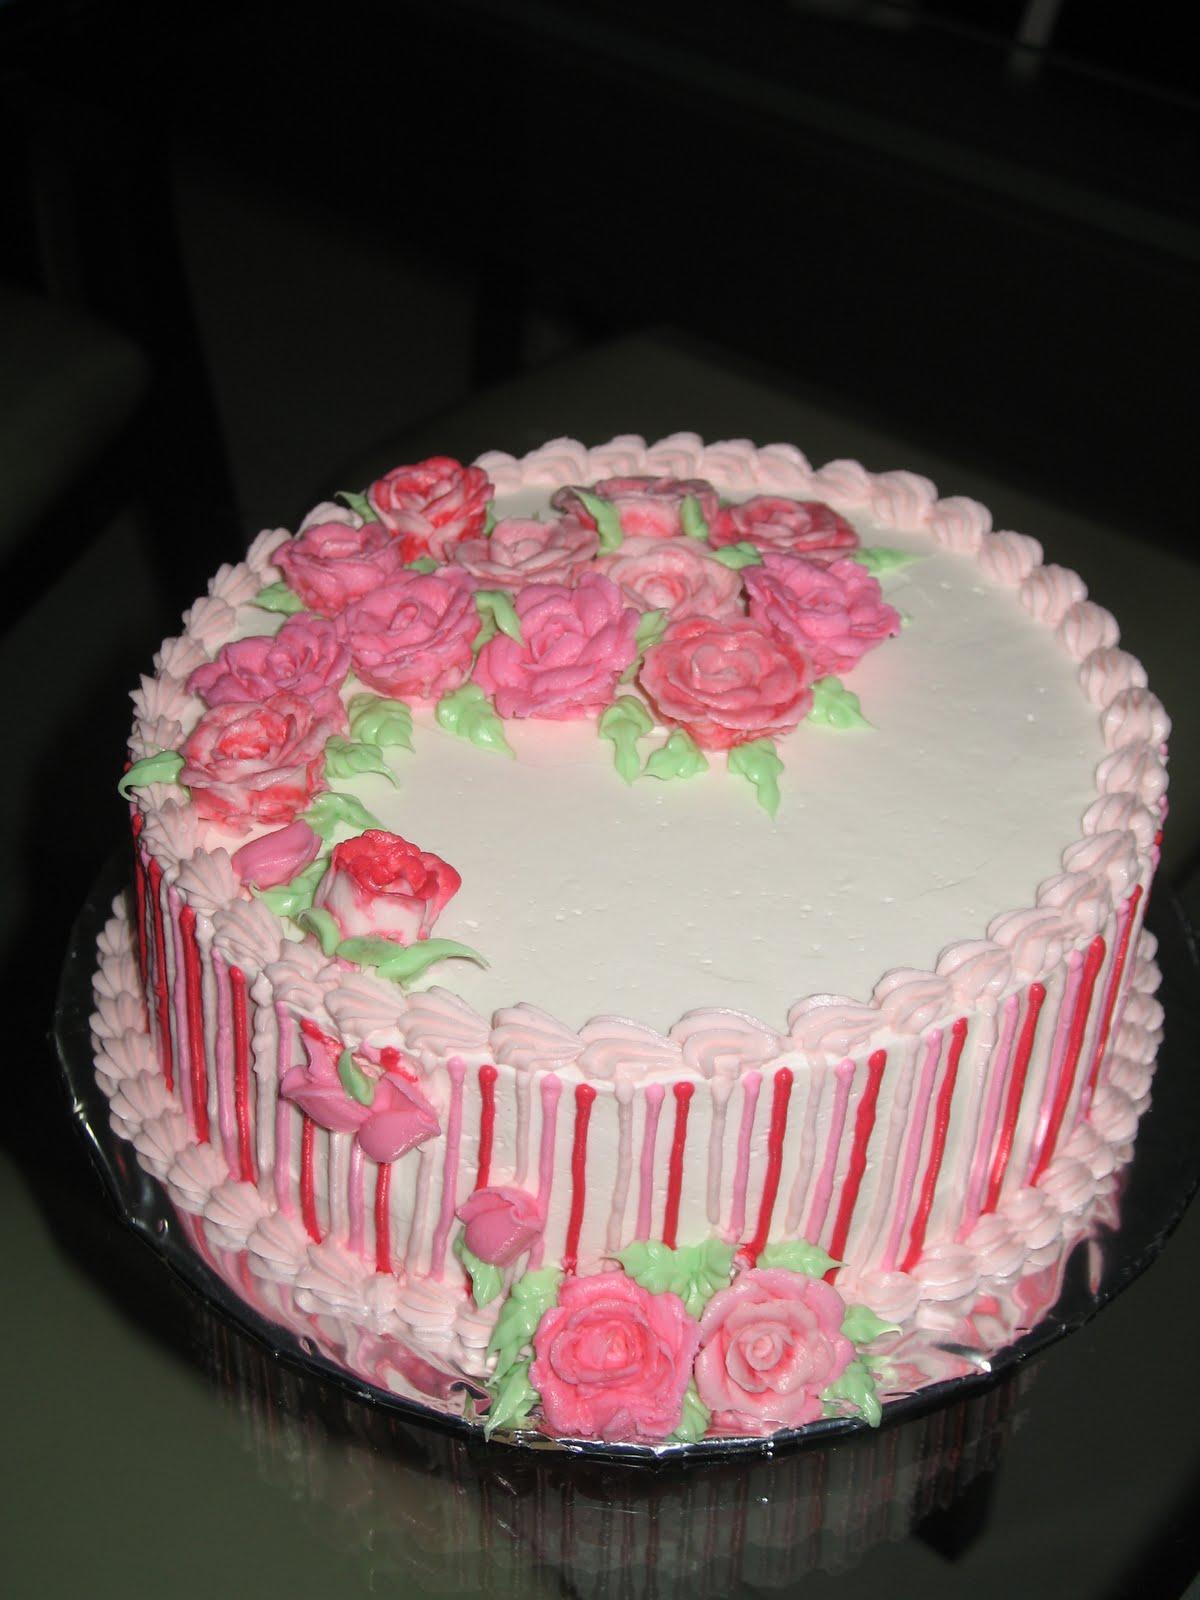 Fun In Cake Decorating: Wilton Cake Decorating Course 1